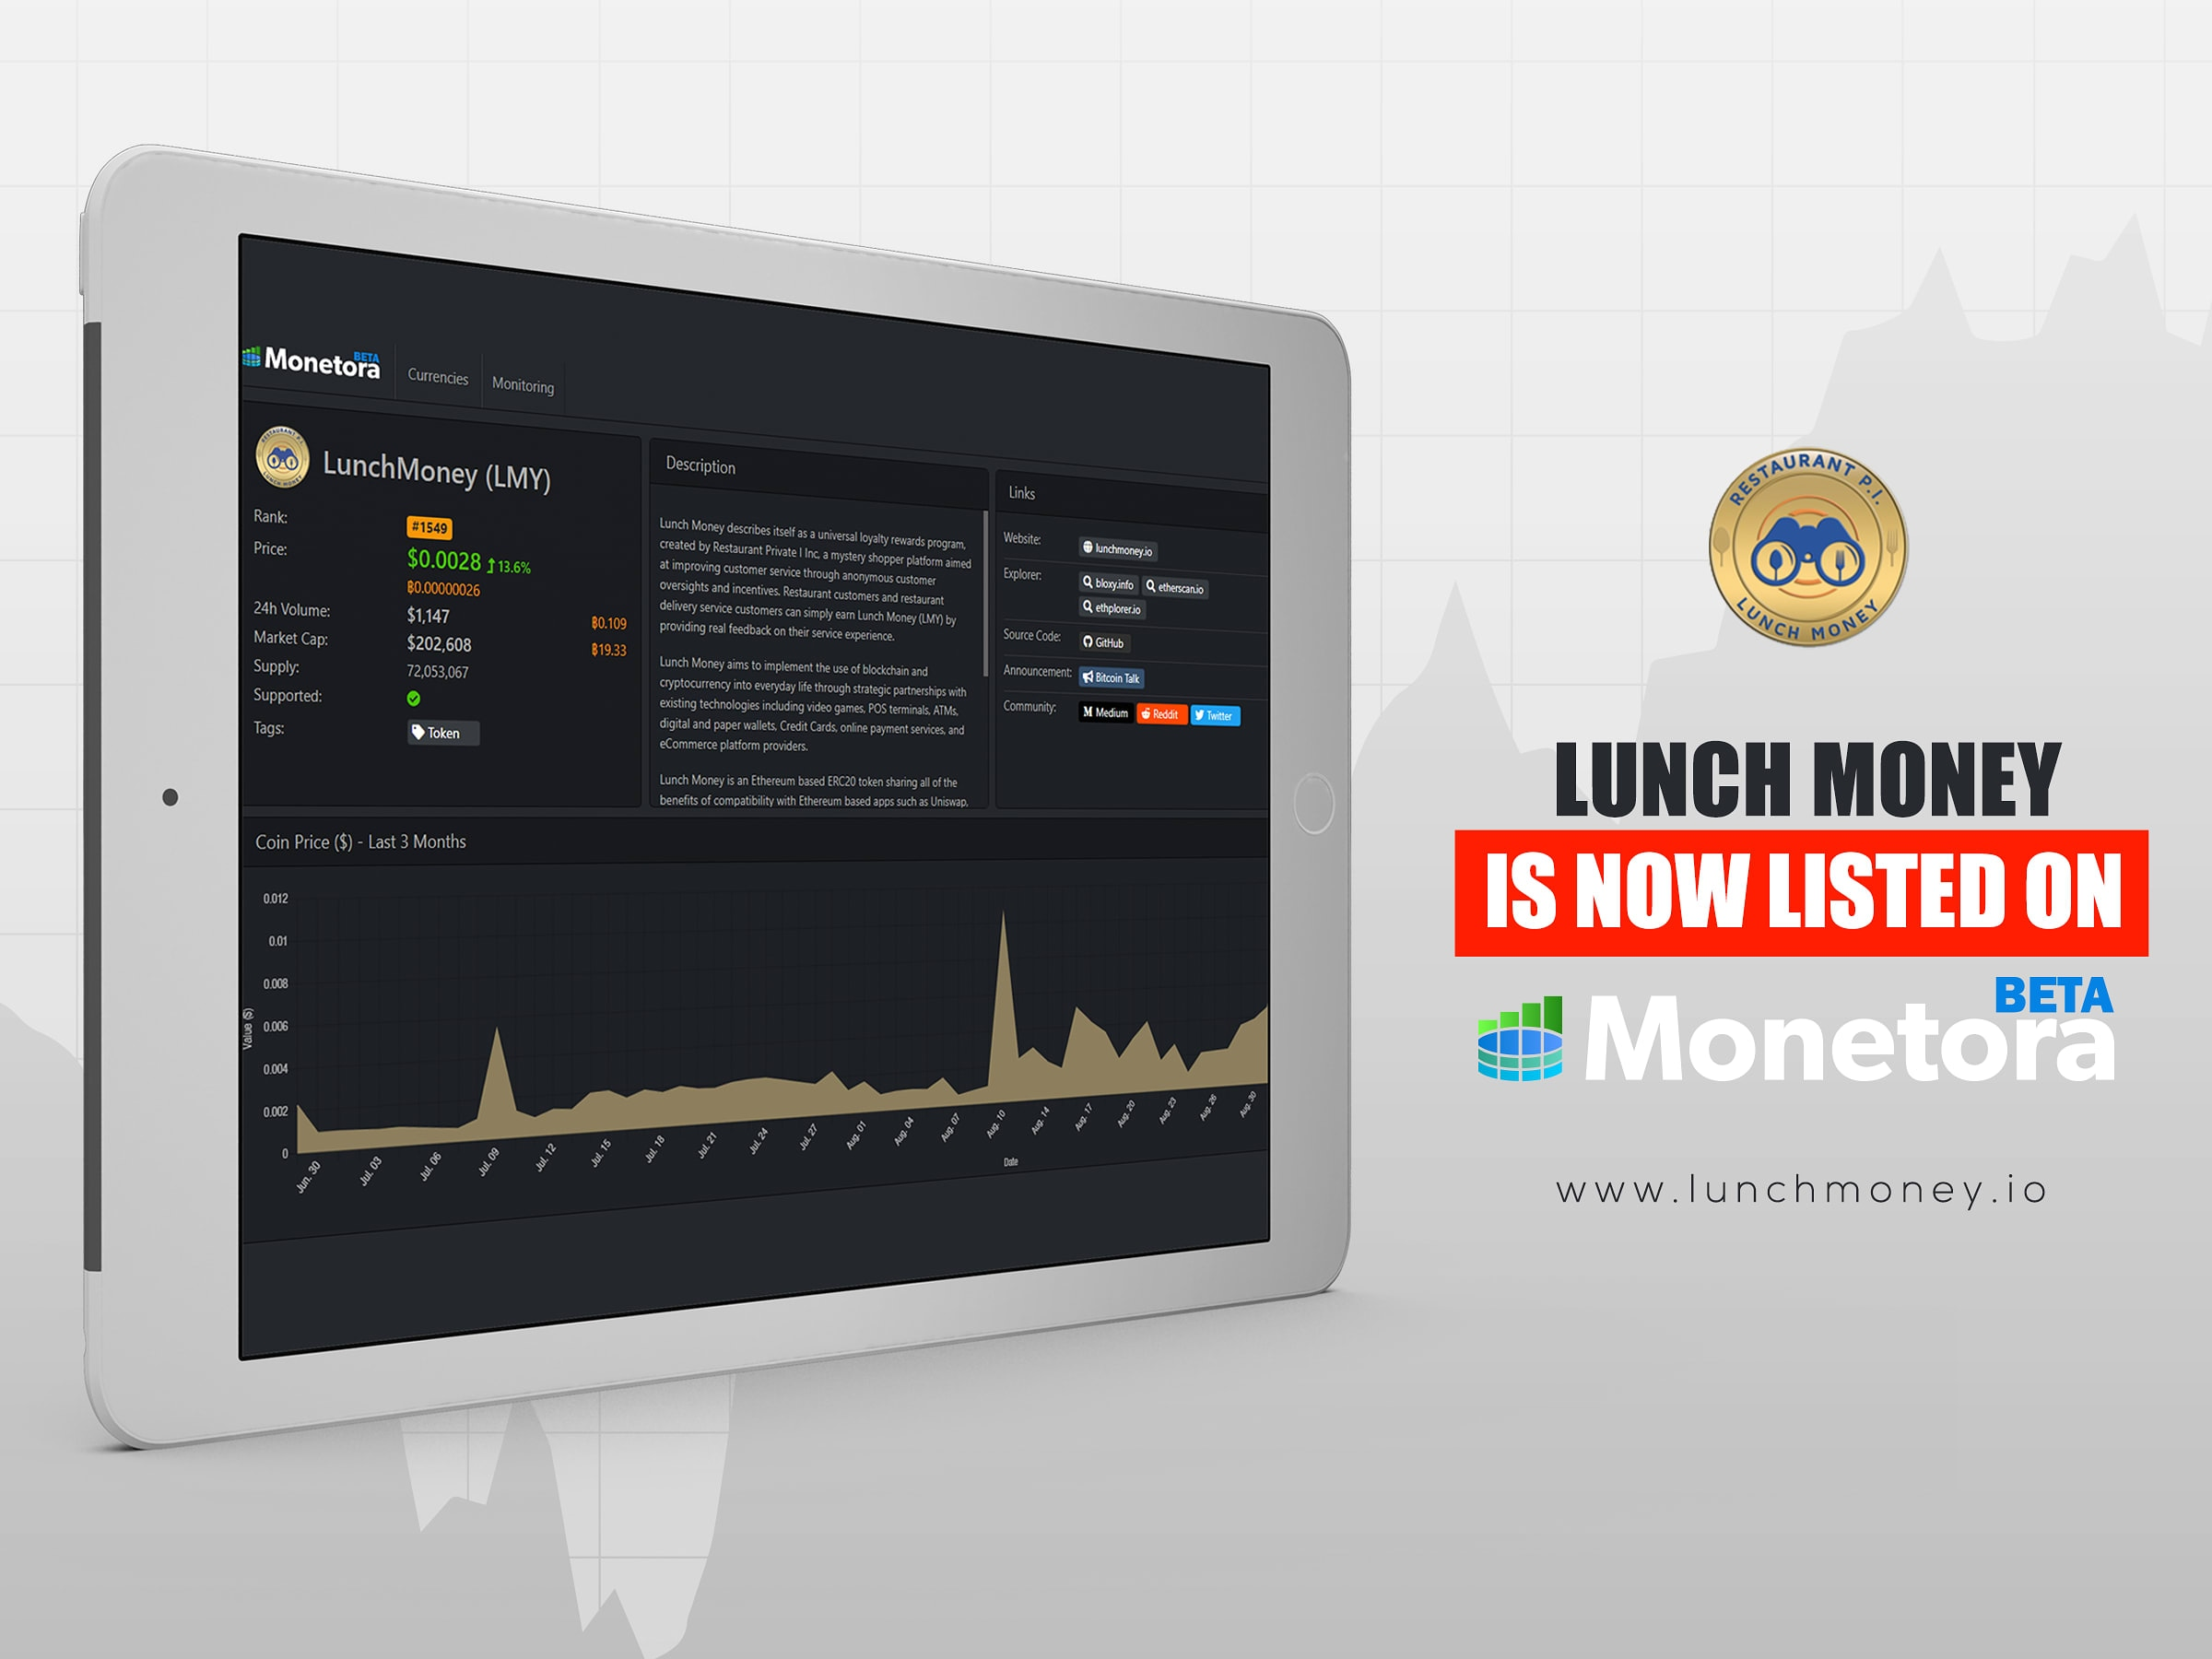 Monetora has added Lunch Money for Analytics Tracking